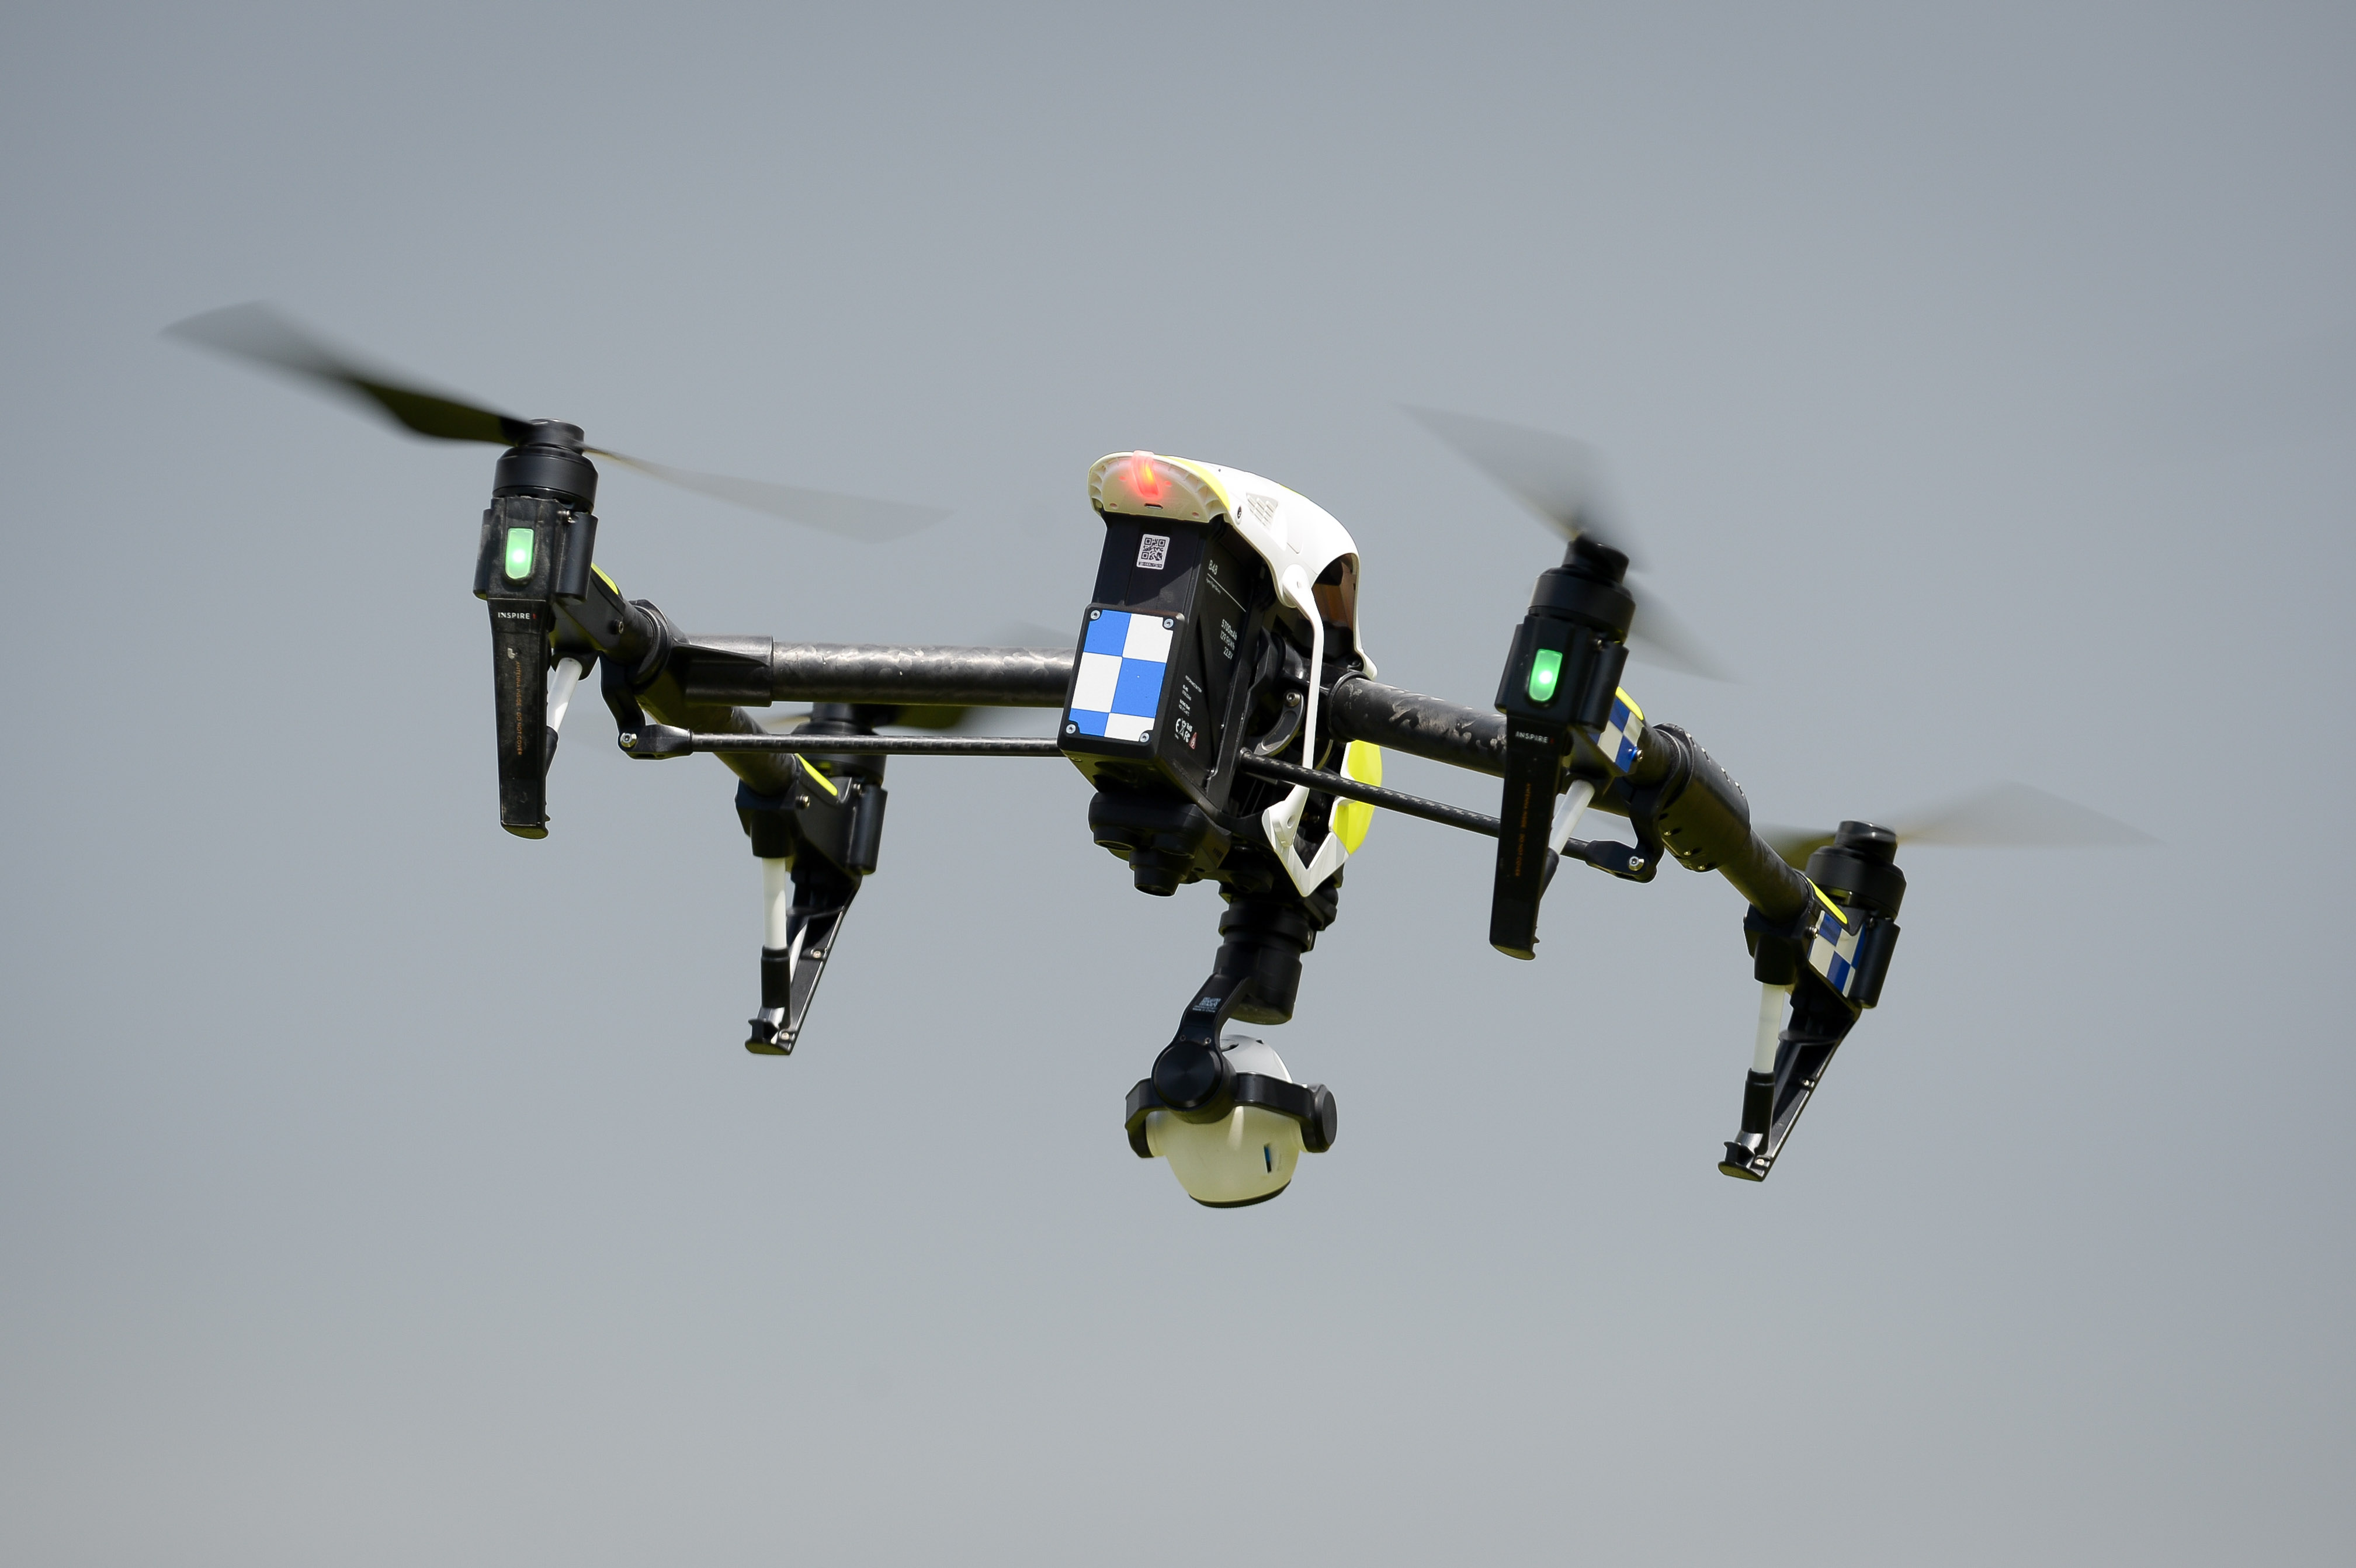 Secret Service to Test Tethered Drone at Trump NJ Golf Club